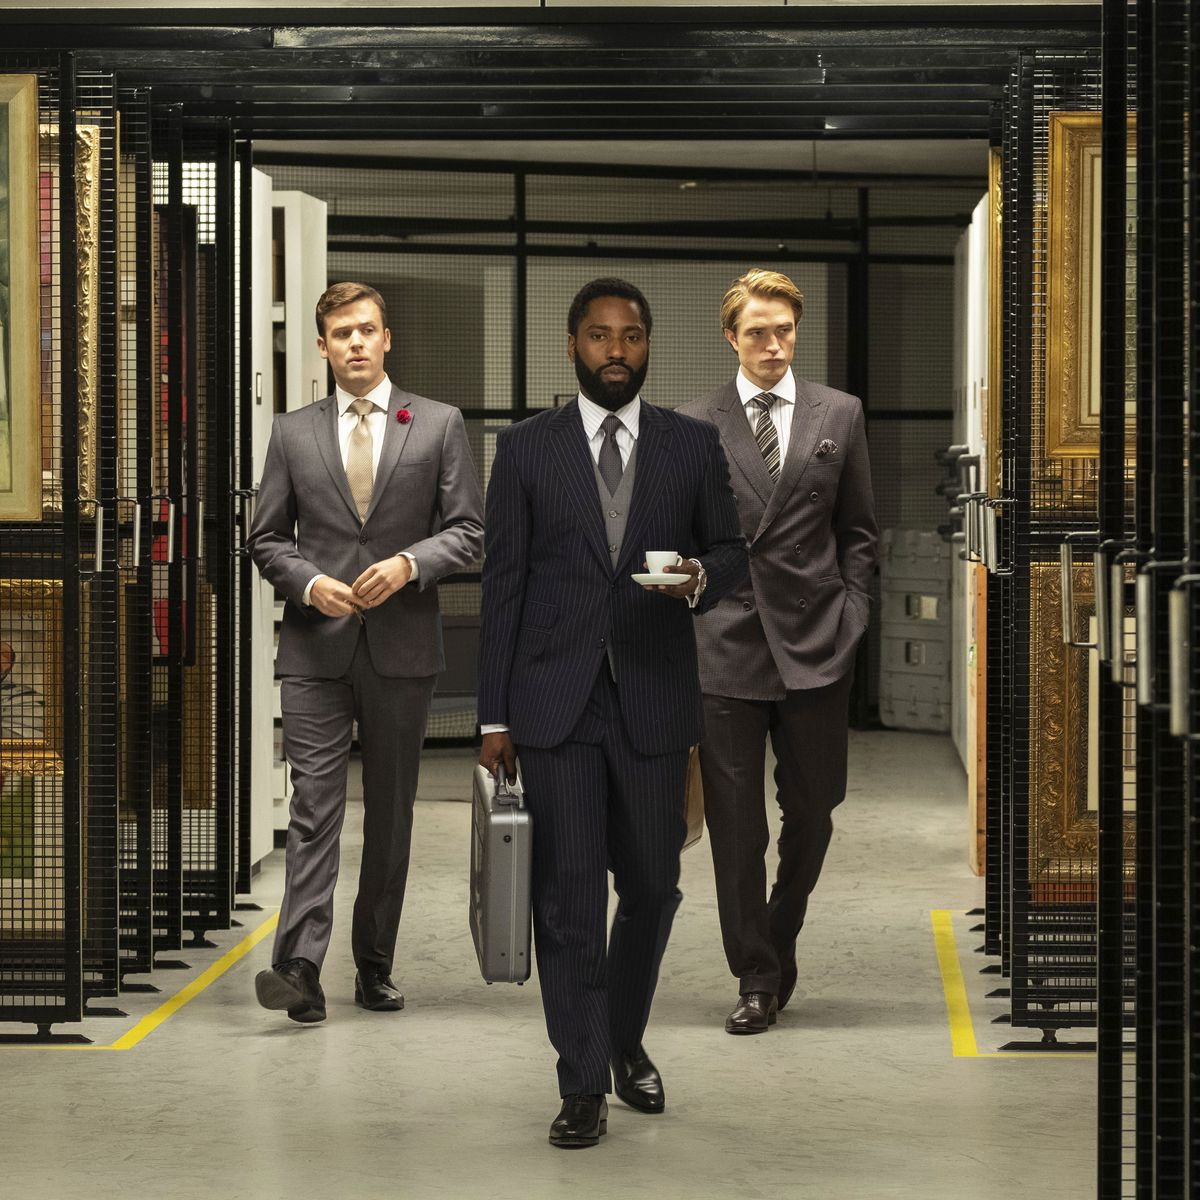 Tenet with John David Washington and Robert Pattinson